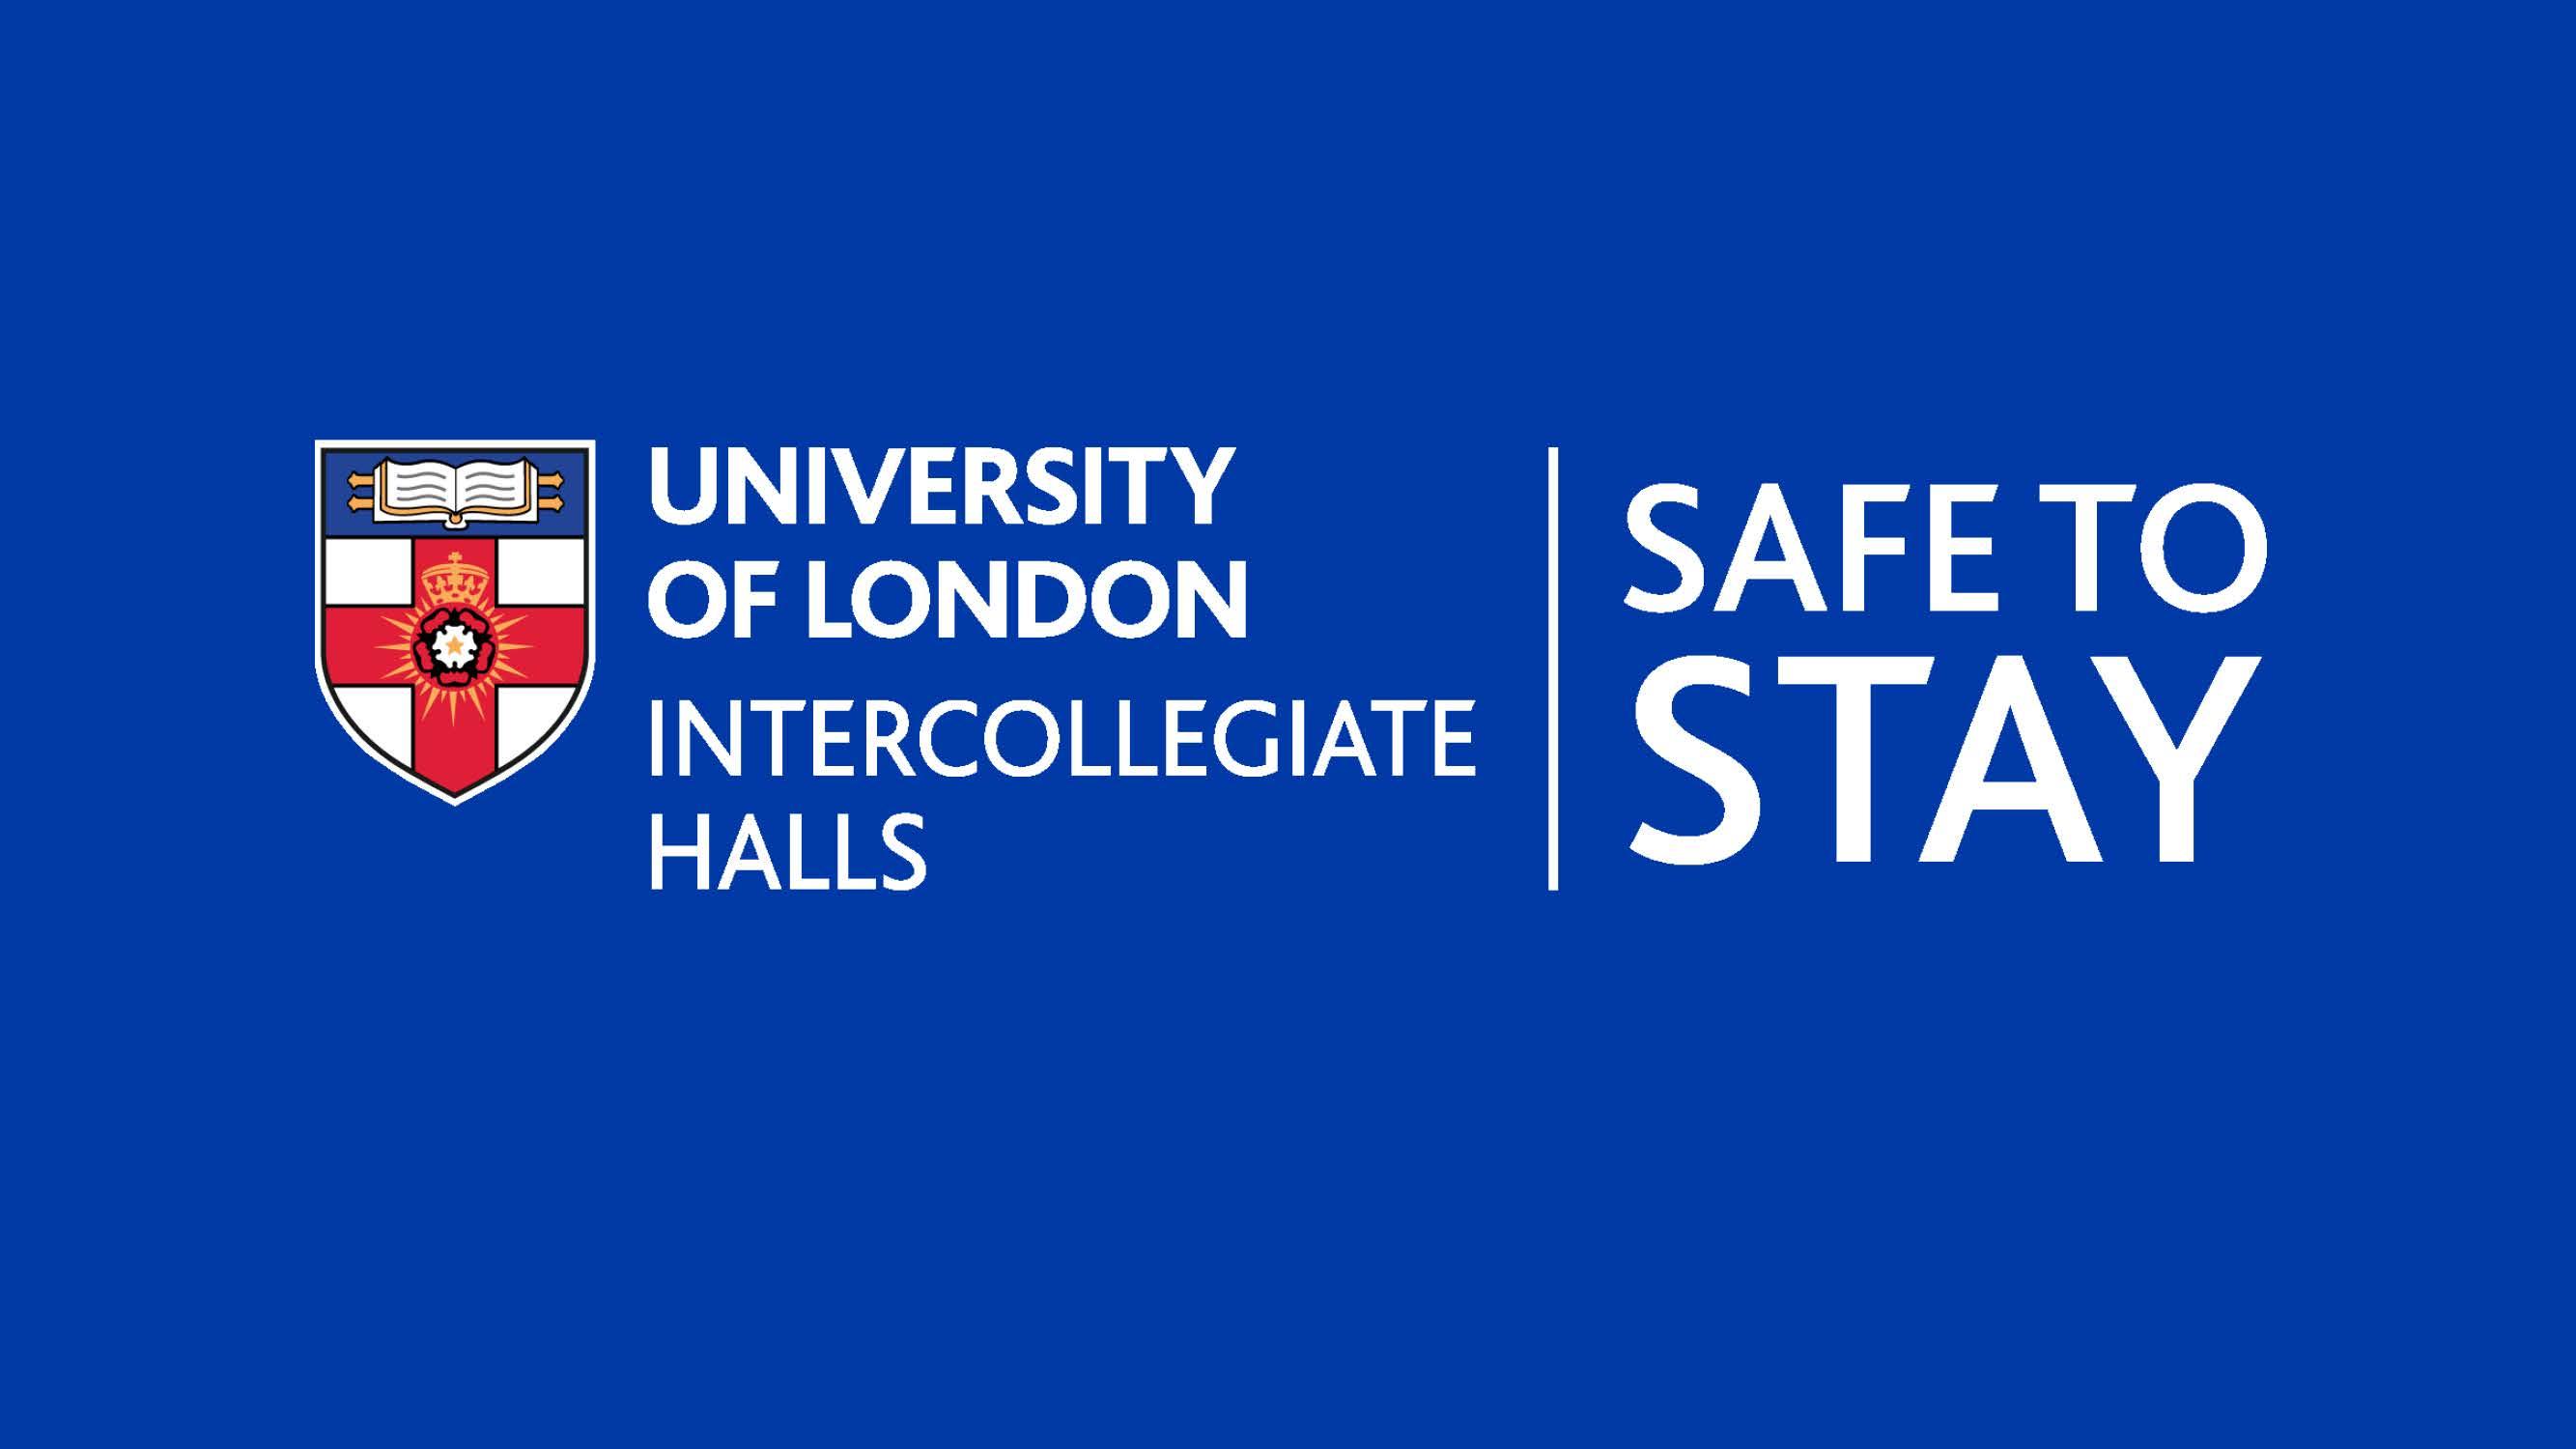 Safe to Stay logo on blue background